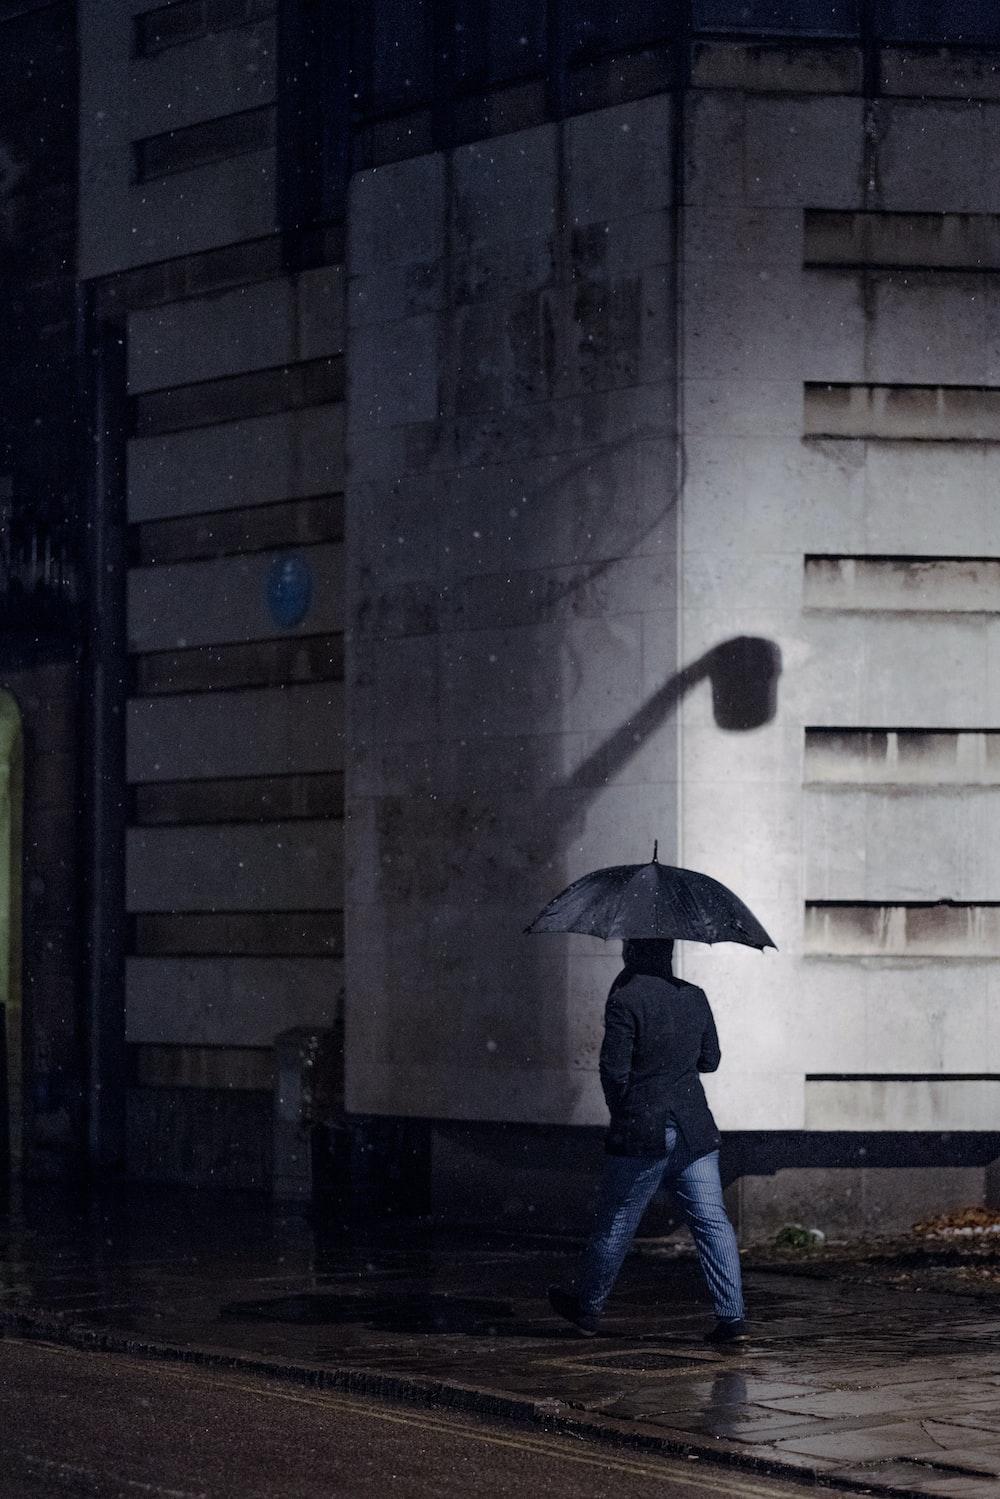 man walking under his umbrella